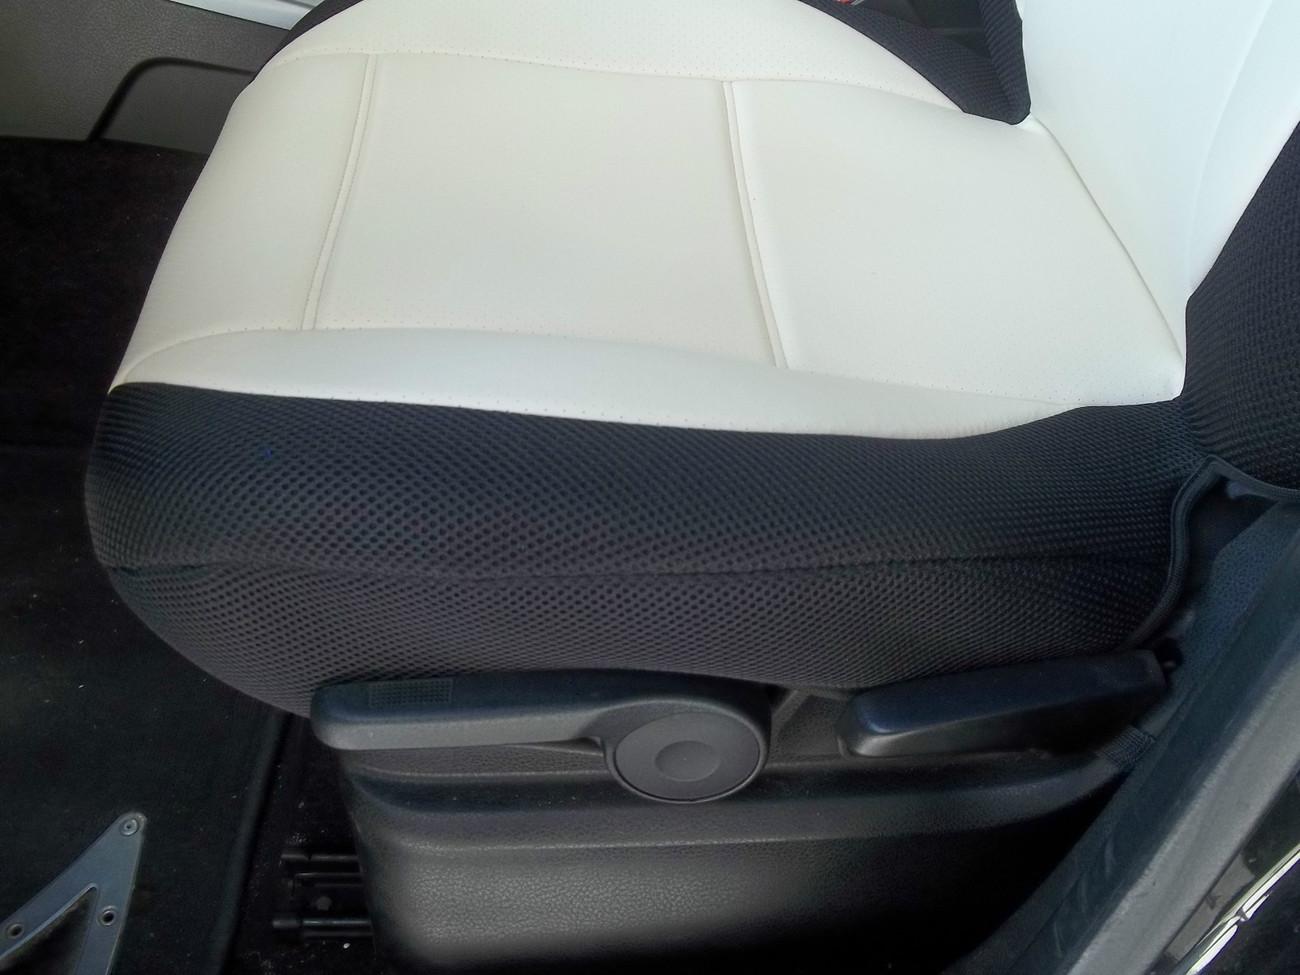 Honda cr v 2012 leatherette synthetic two front for Honda crv car cover